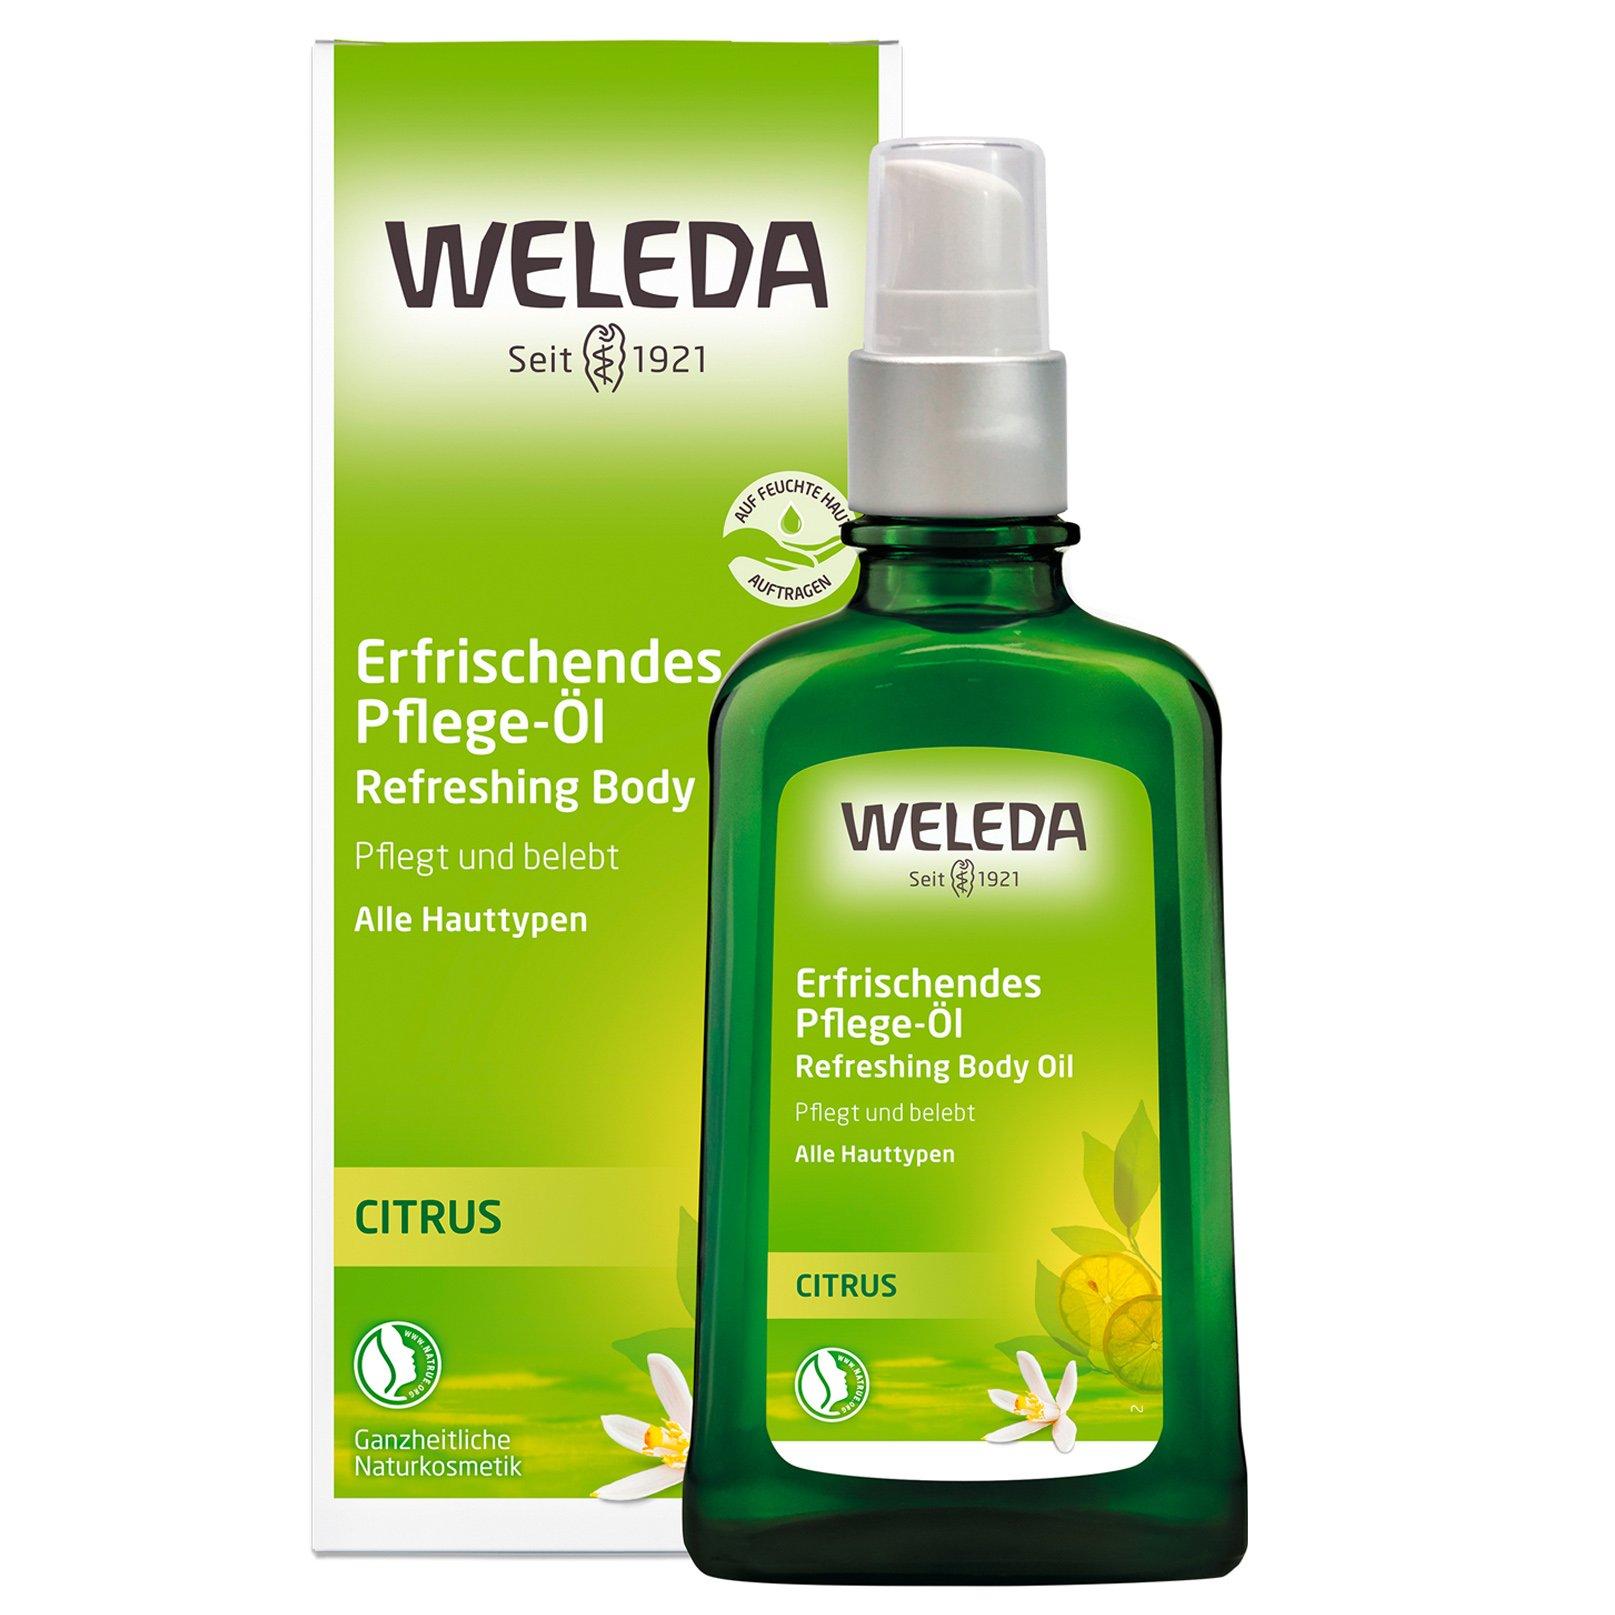 Weleda Citrus Refreshing Body Oil for All Skin Types Δροσερό Λάδι Σώματος με Κίτρο για Τόνωση & Ενυδάτωση του Δέρματος 100ml